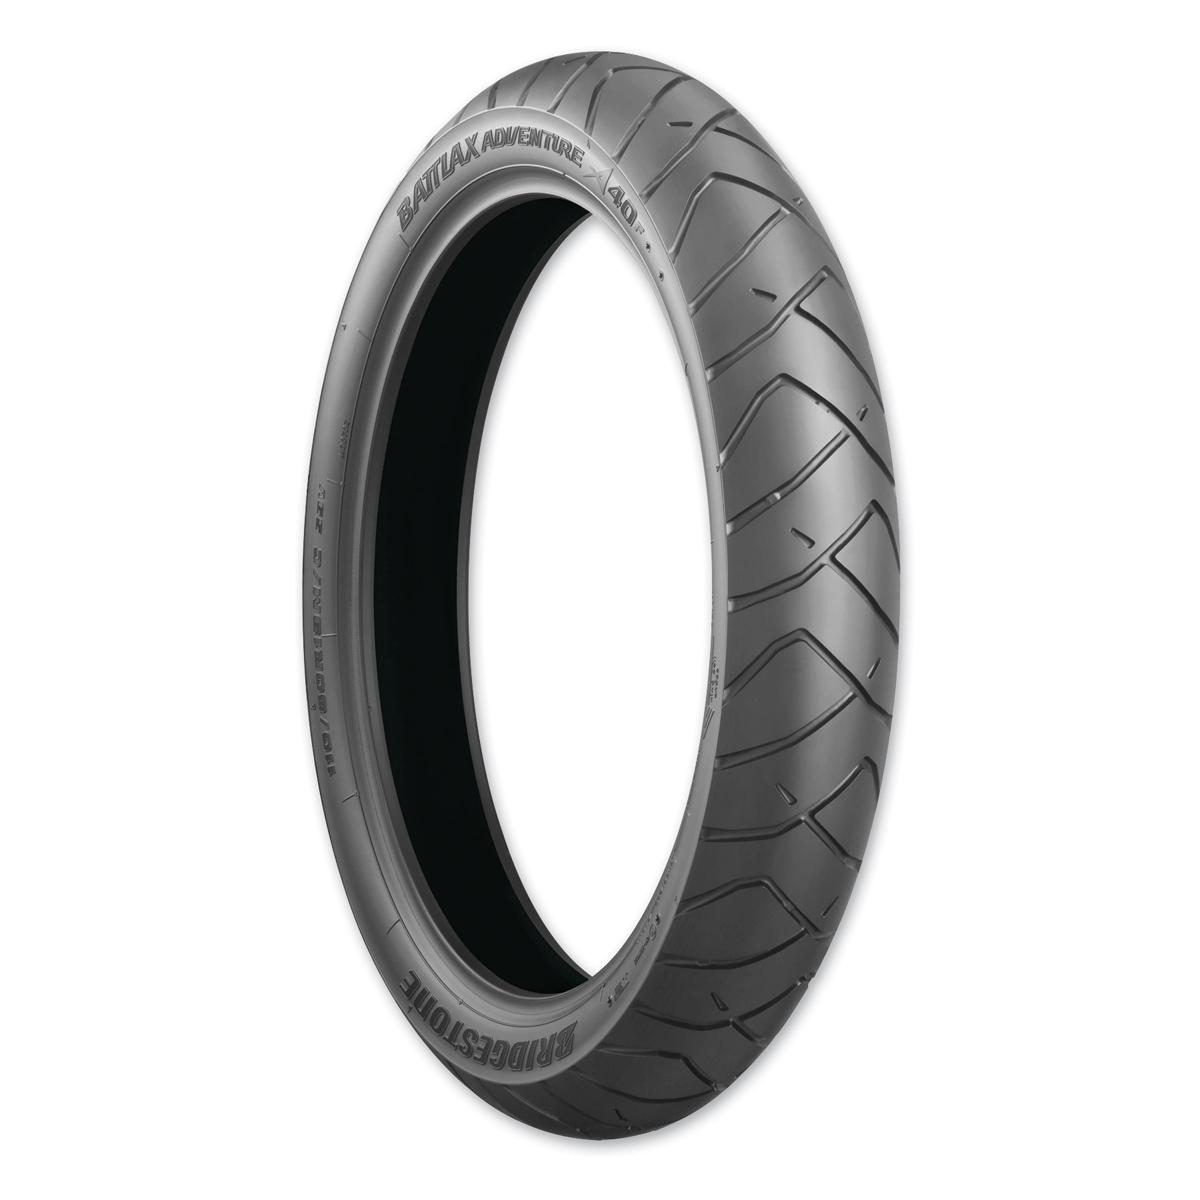 Bridgestone A40 110/80R19 Front Tire